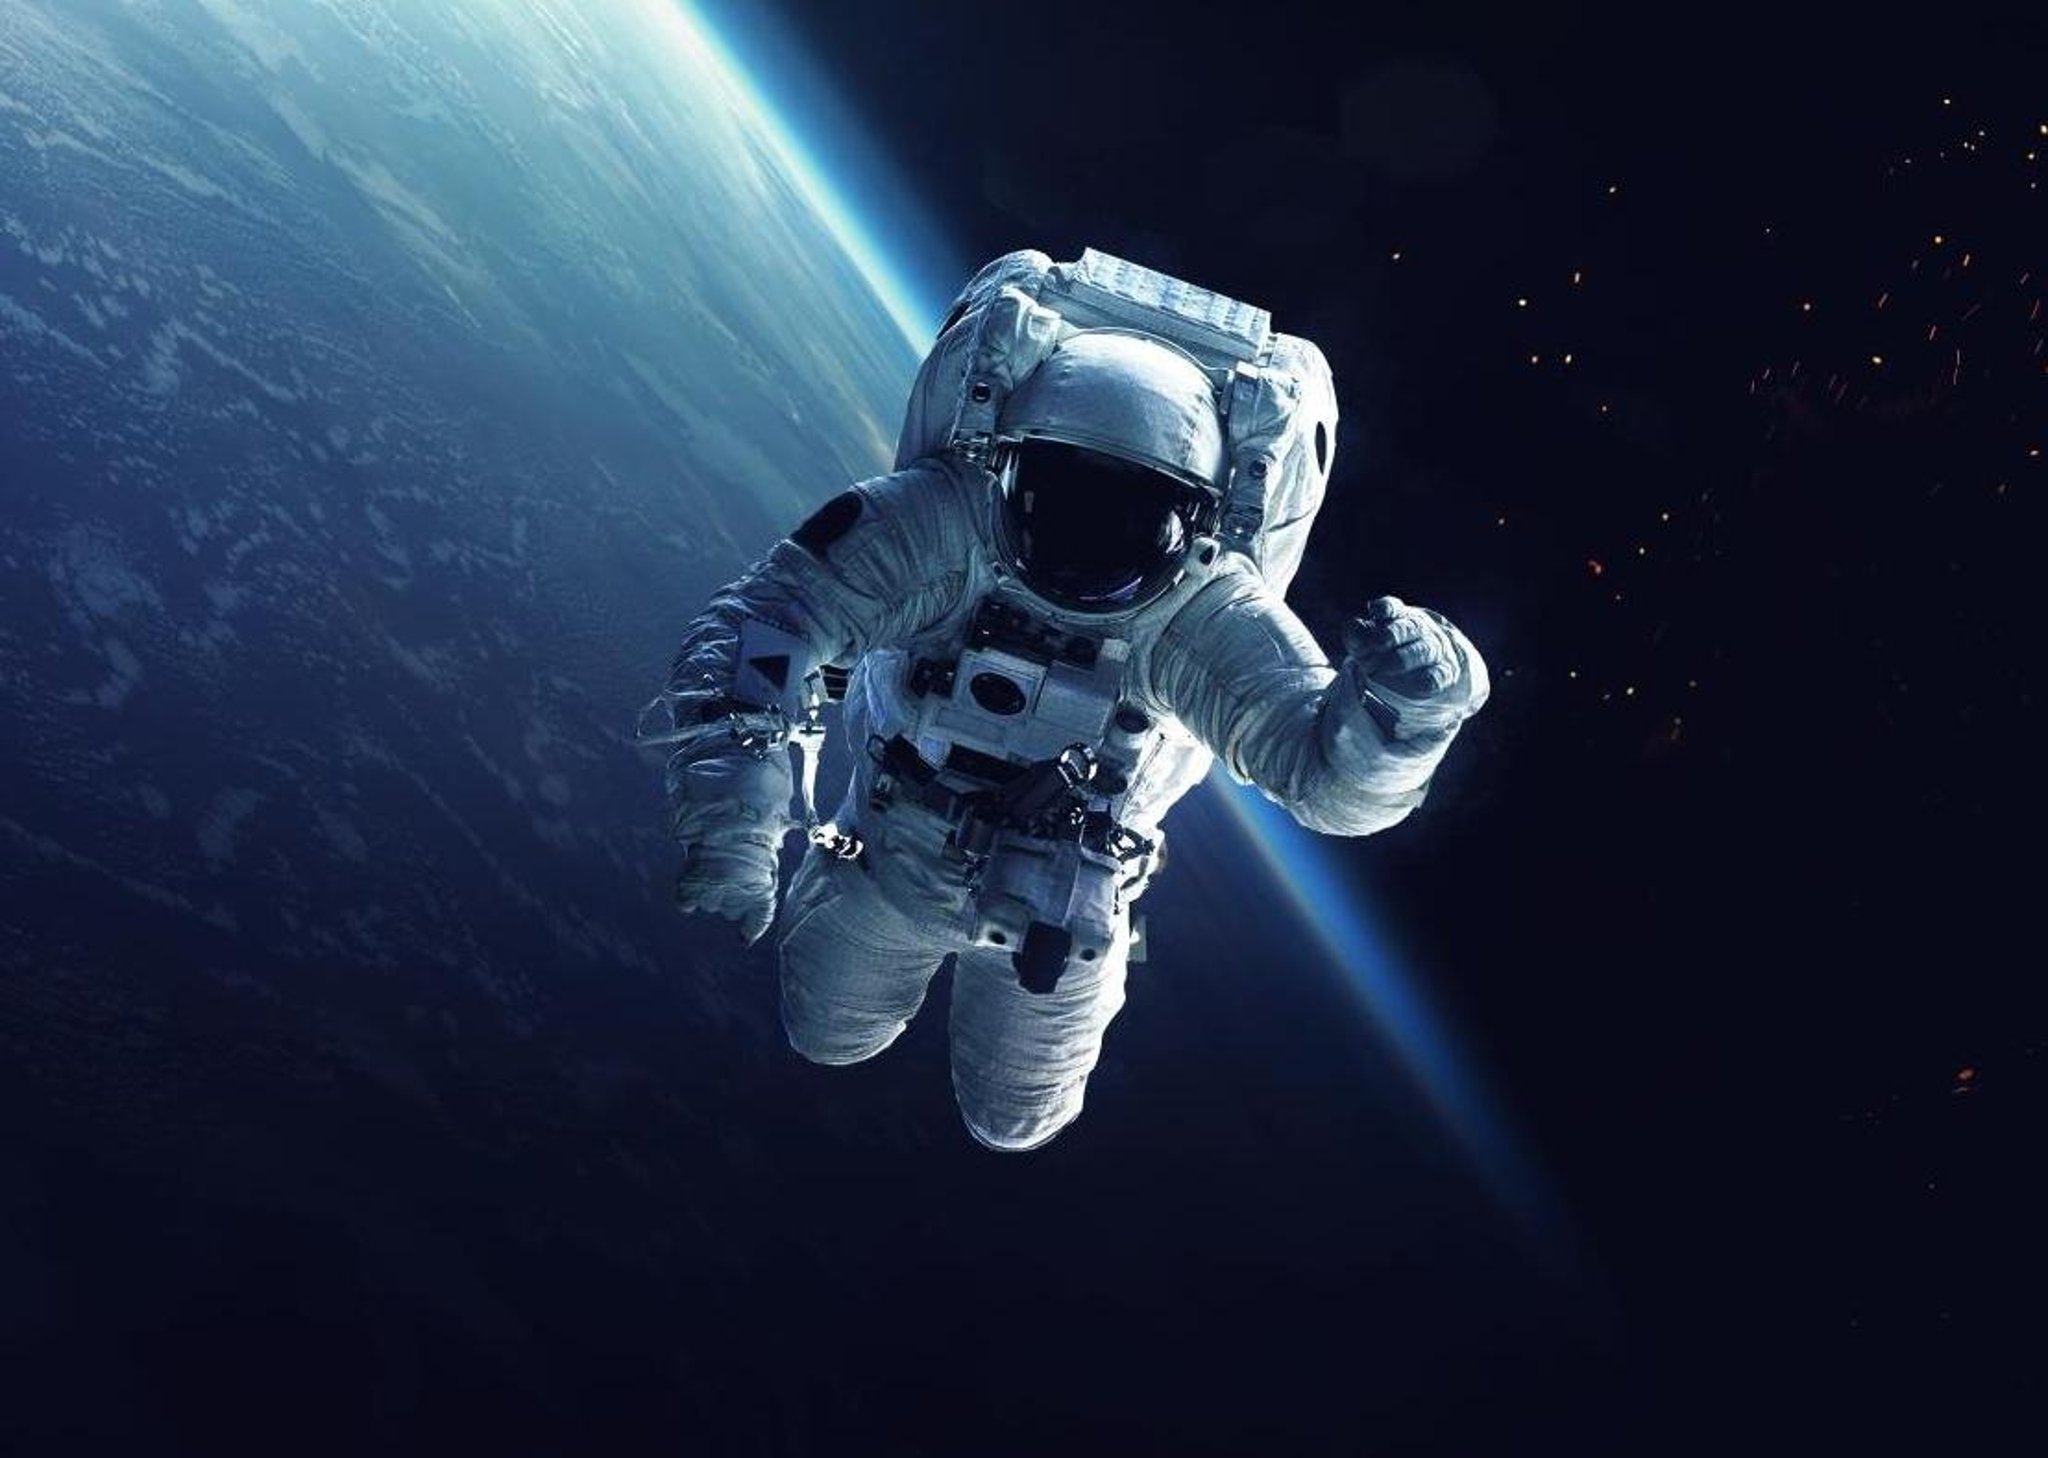 European Space Agency to hire first disabled astronaut | முதல் ஊனமுற்ற விண்வெளி வீரரை ஐரோப்பிய விண்வெளி நிறுவனம் பணியமர்த்துகிறது |_40.1